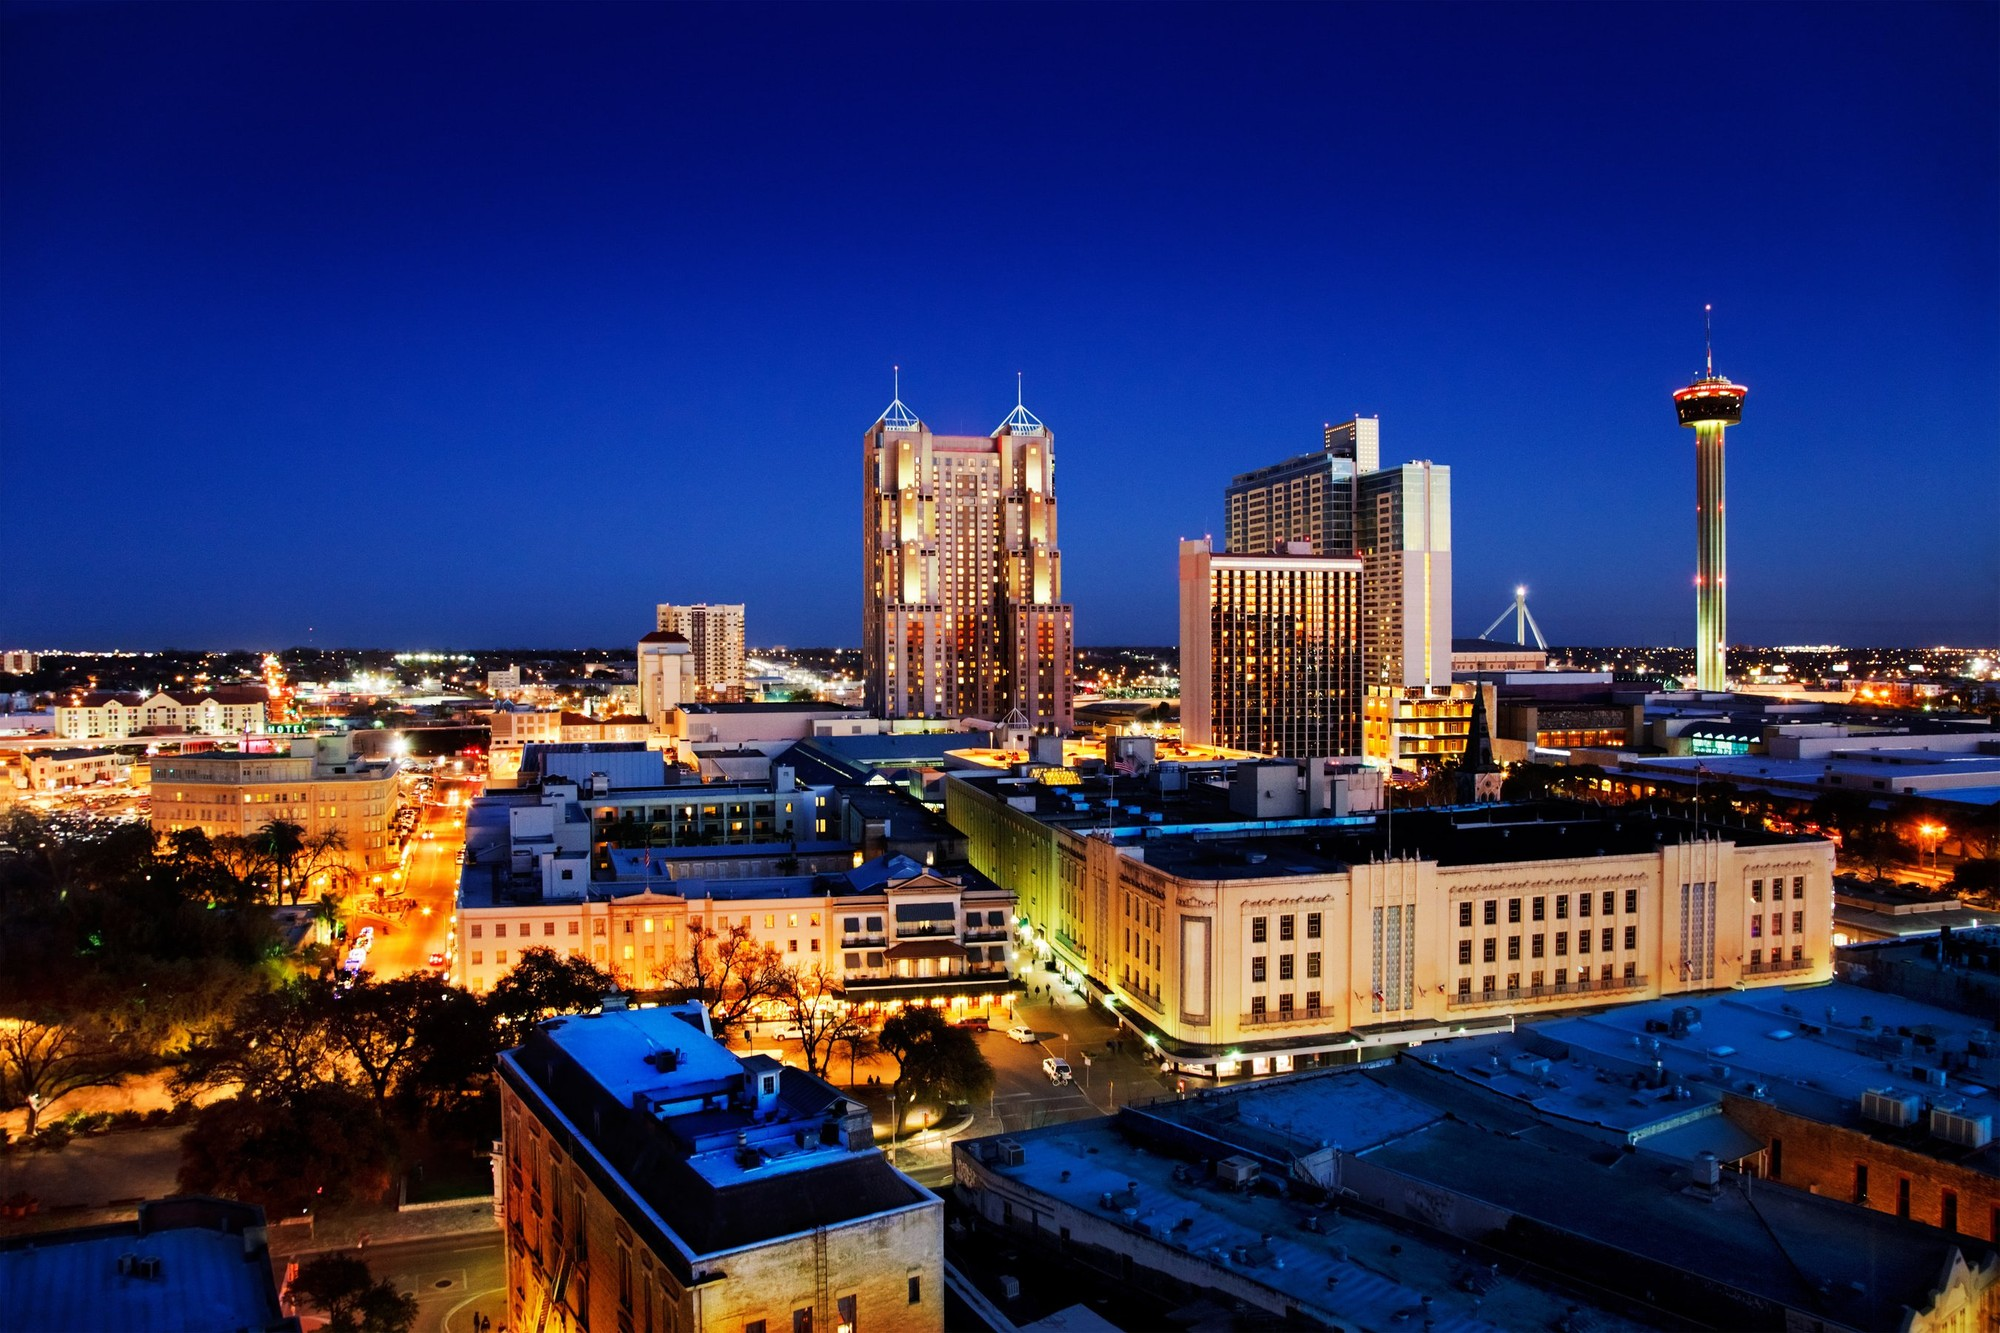 City view of downtown San Antonio